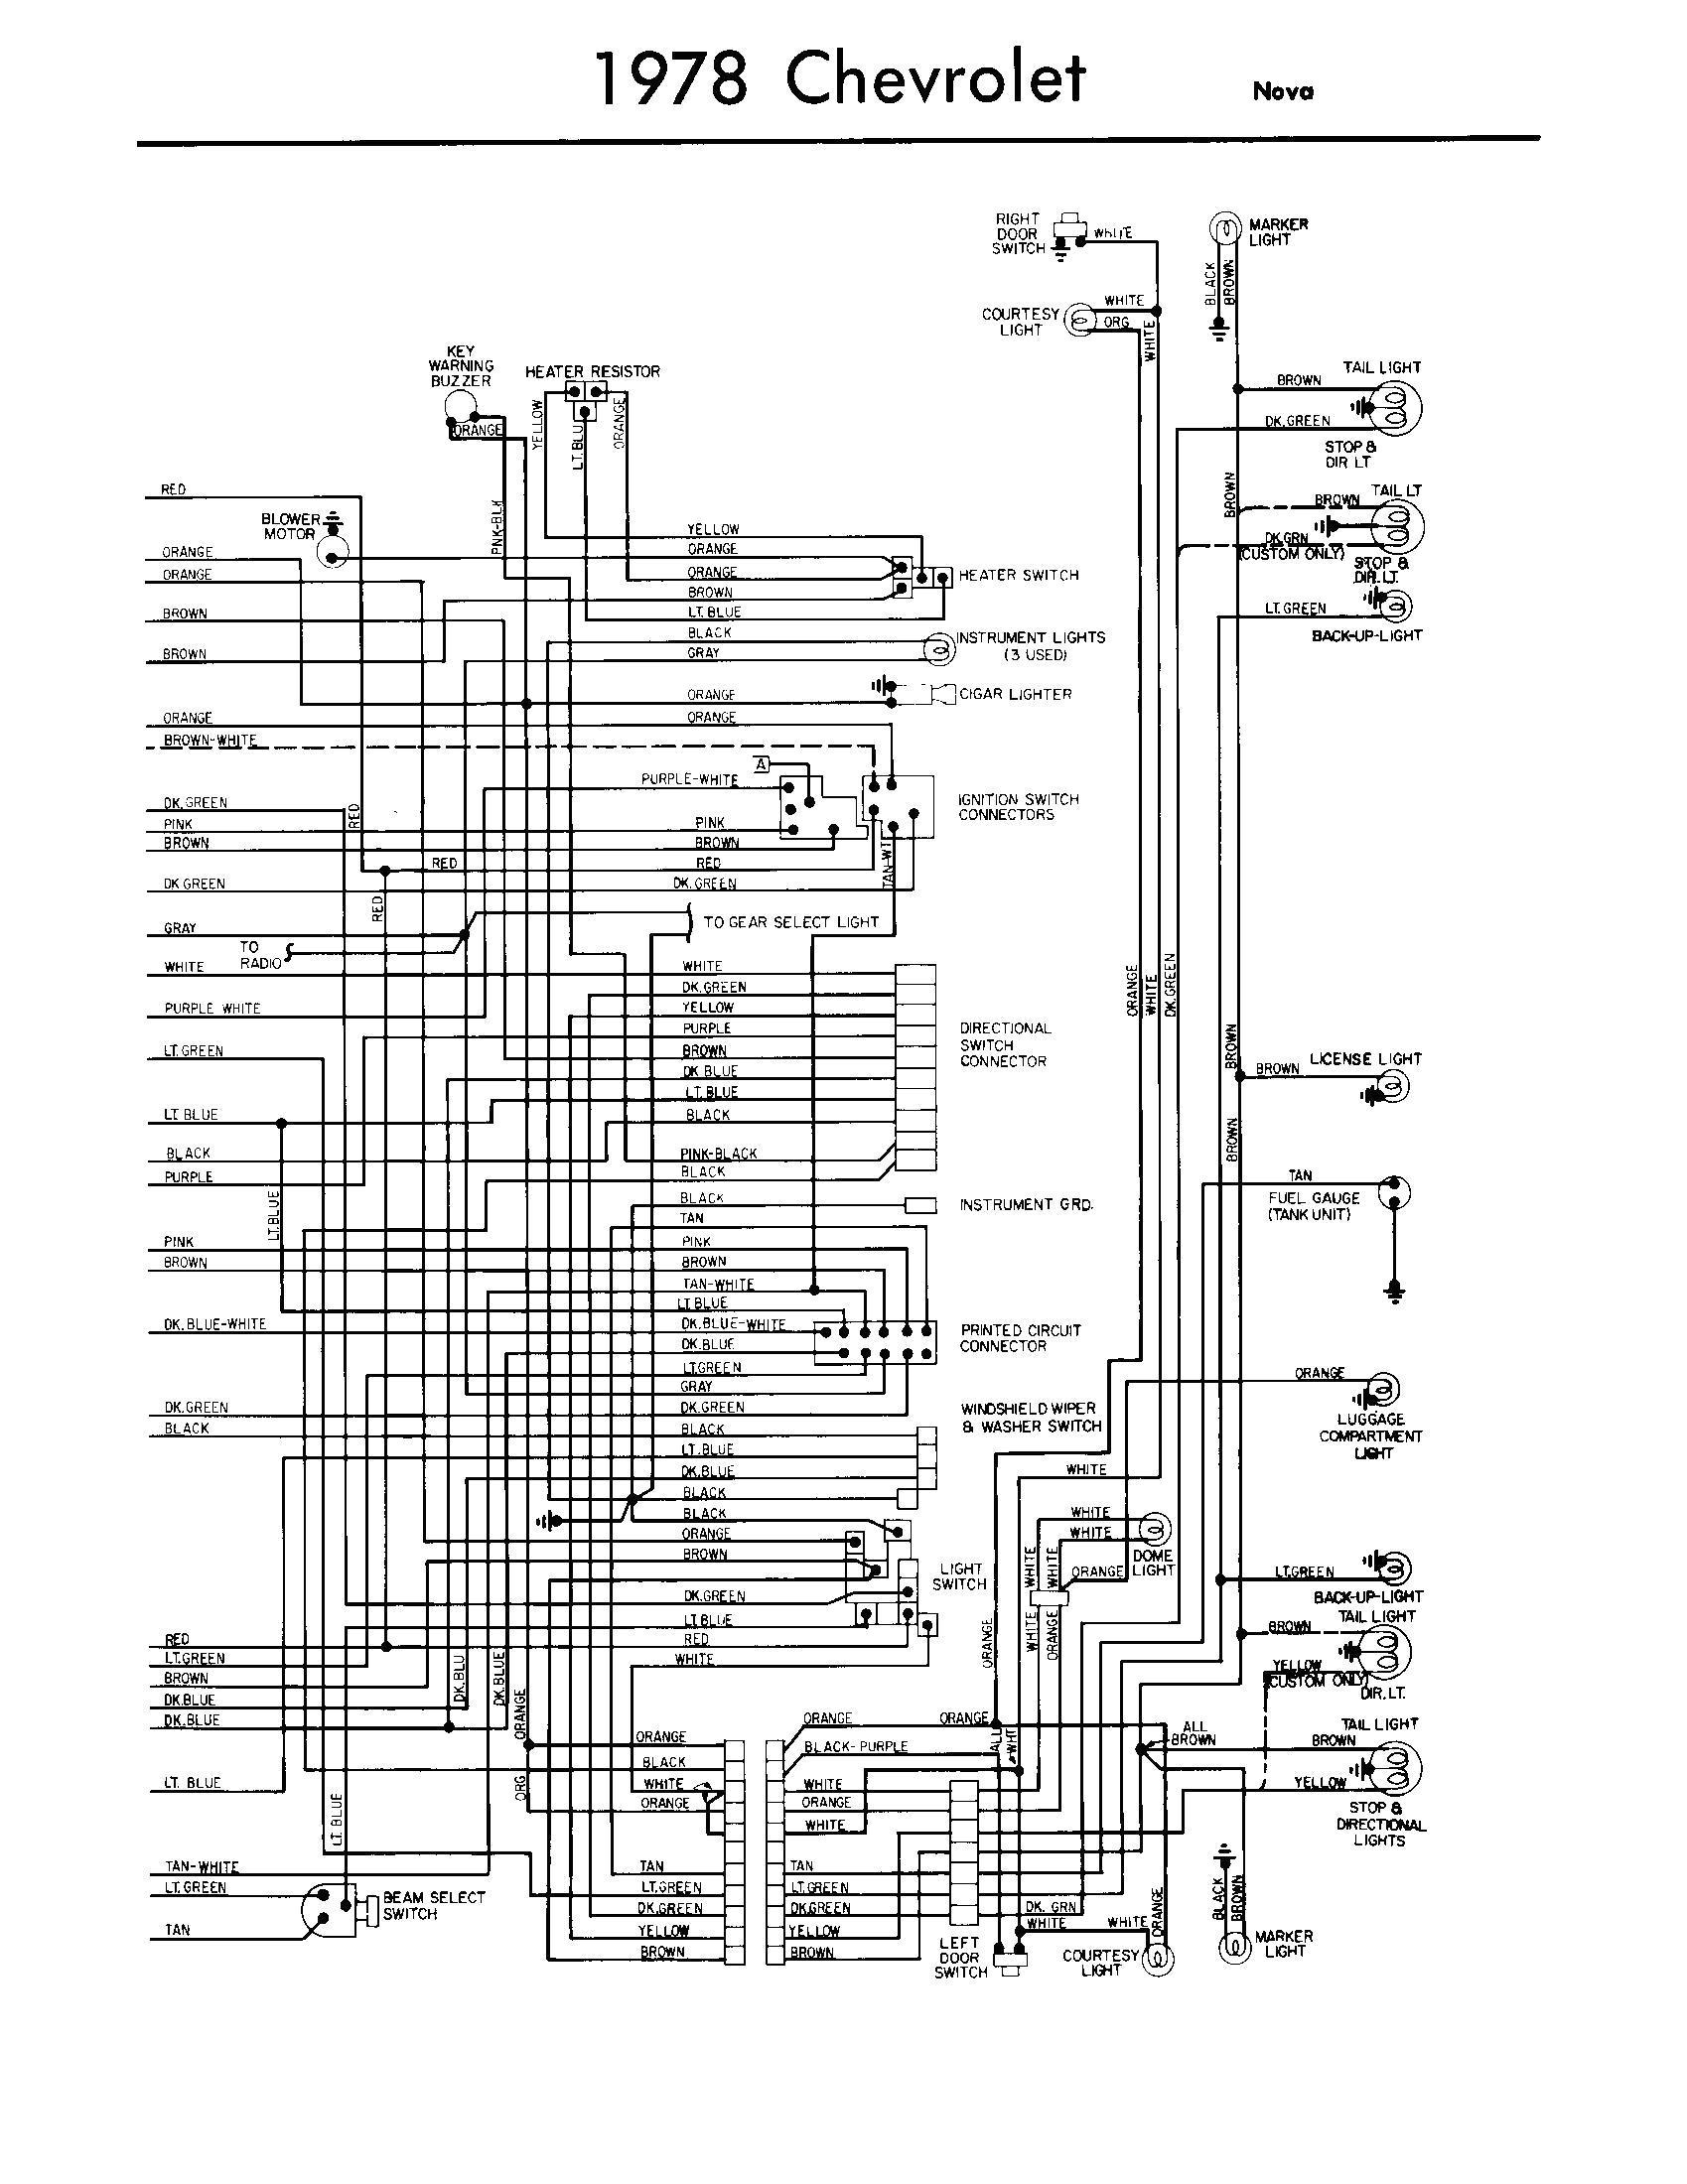 1978 chevy turn signal wiring diagram wiring diagrams favorites